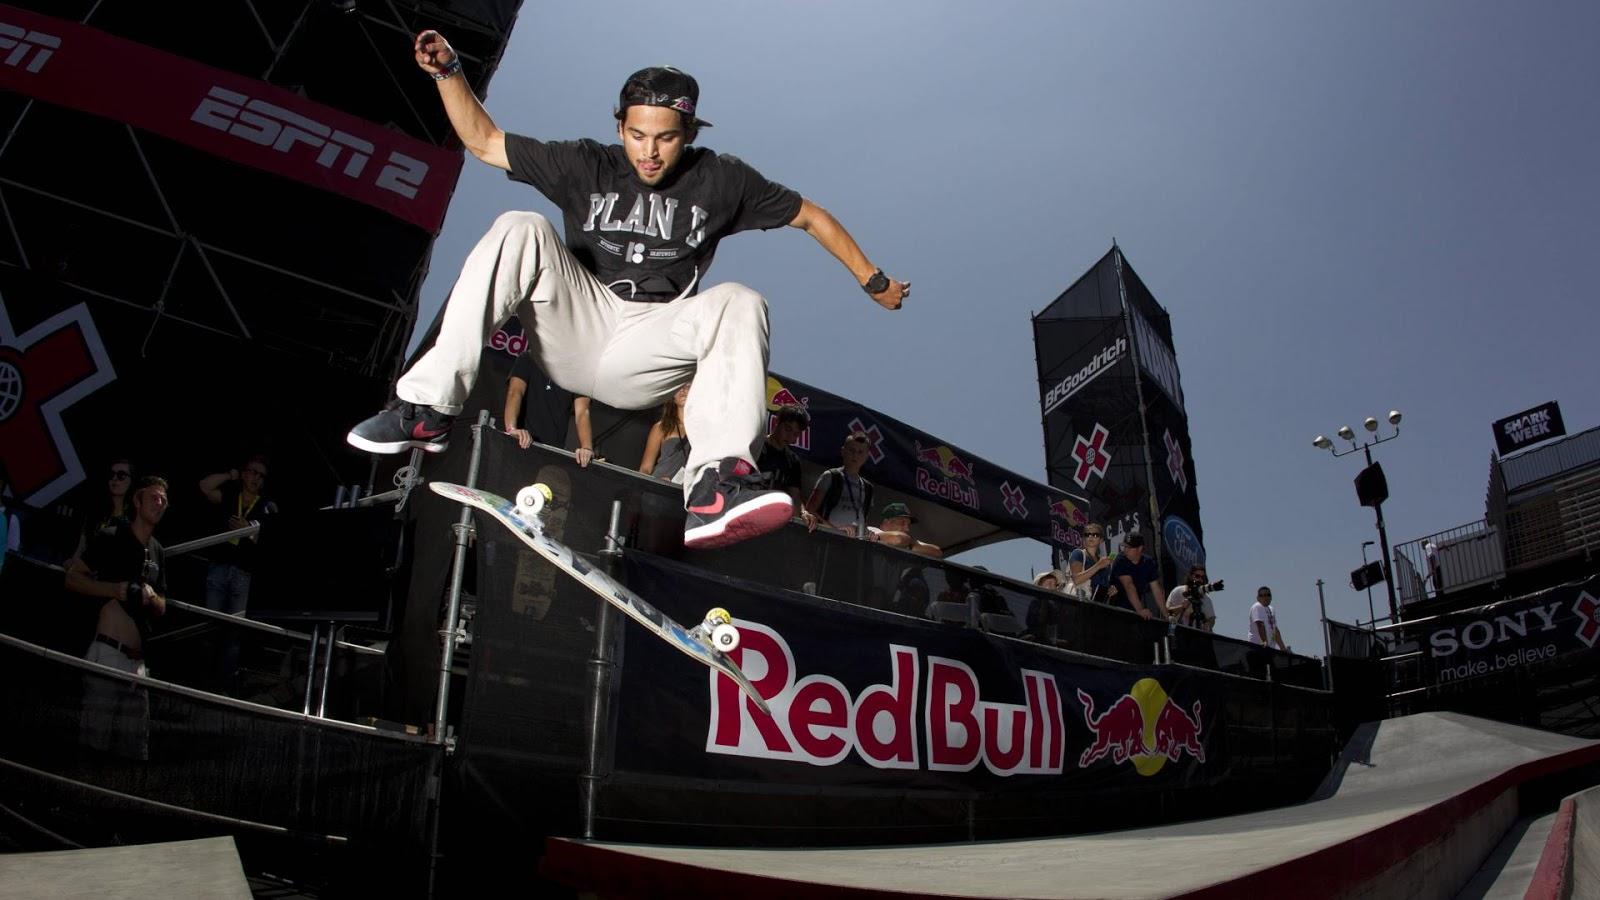 Paul rodriguez skater 2013